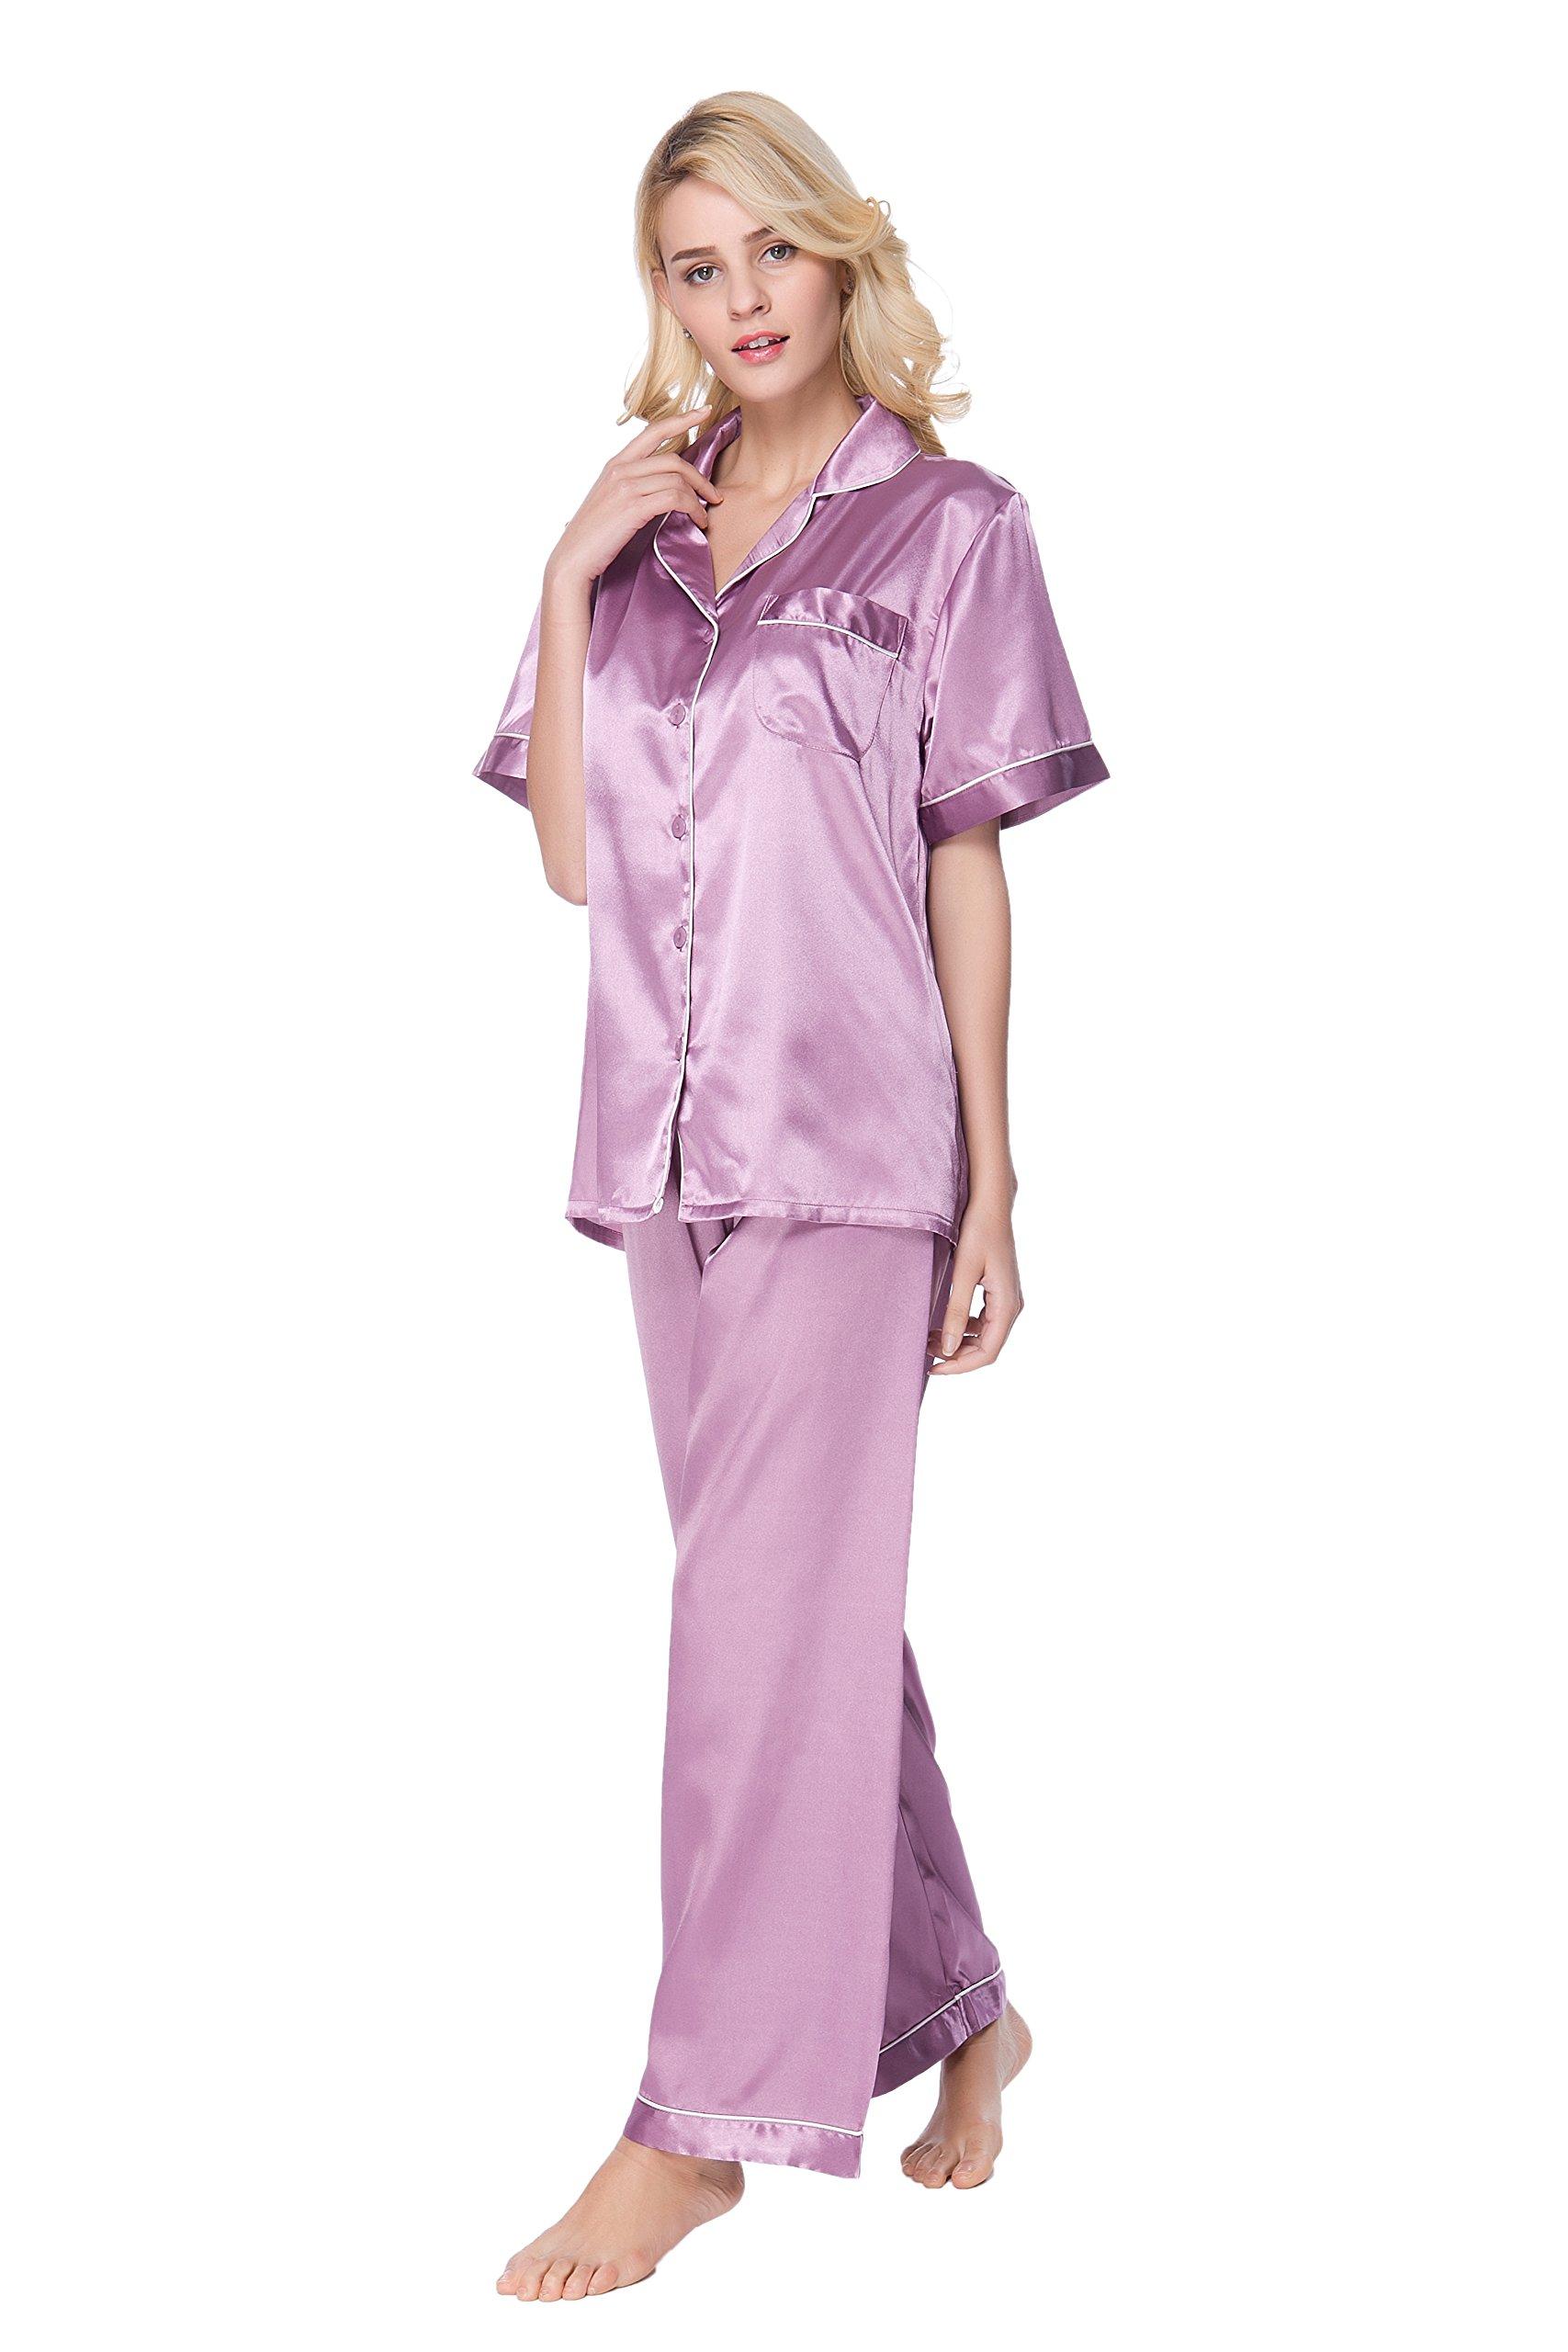 Lavenderi Women's Short Sleeve Classtic Satin Pajama Set